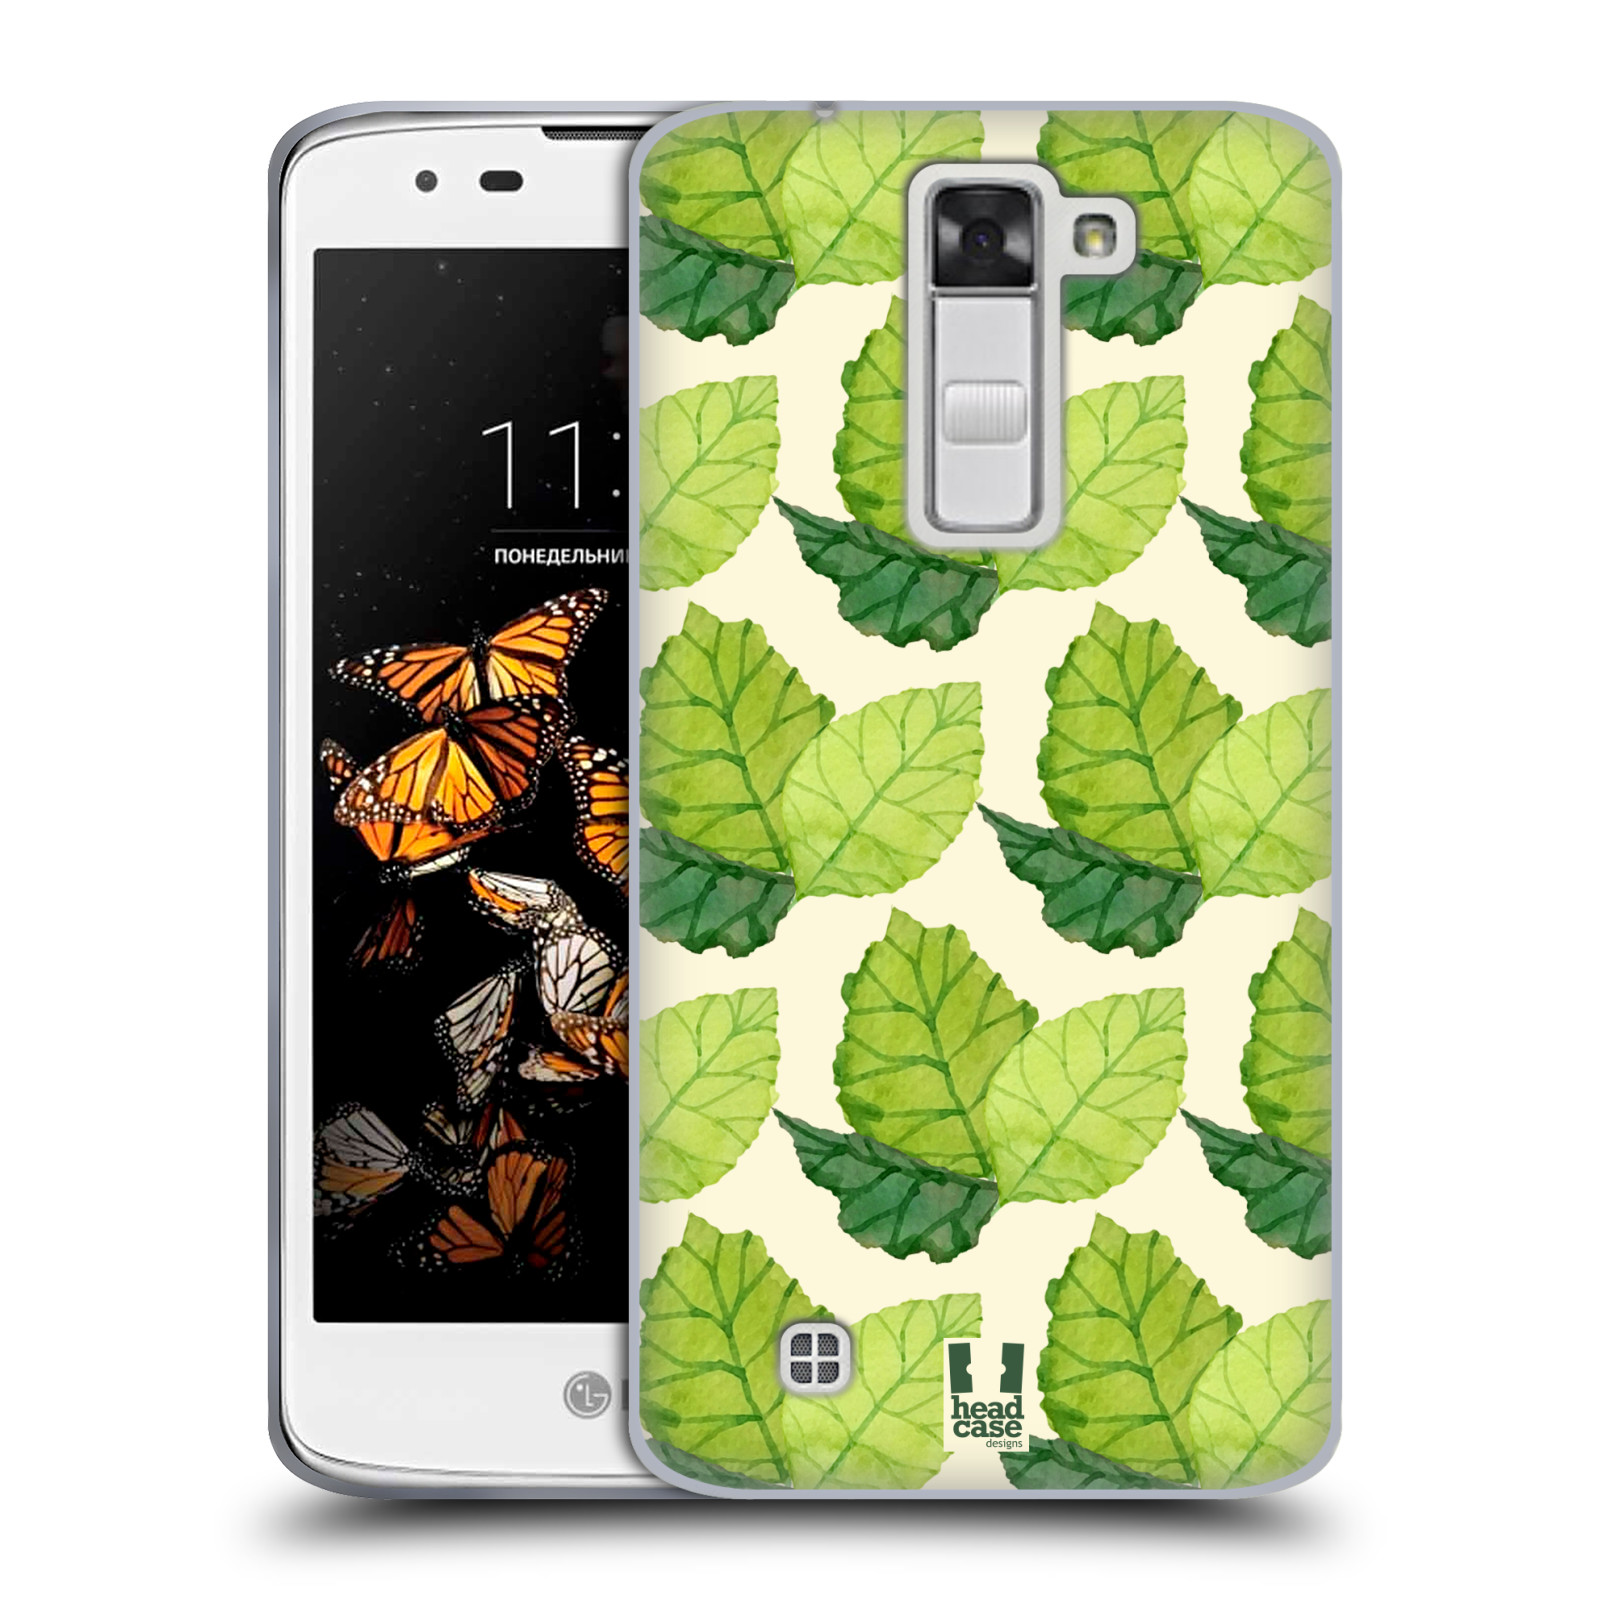 HEAD-CASE-DESIGNS-GREENERY-SOFT-GEL-CASE-FOR-LG-PHONES-2